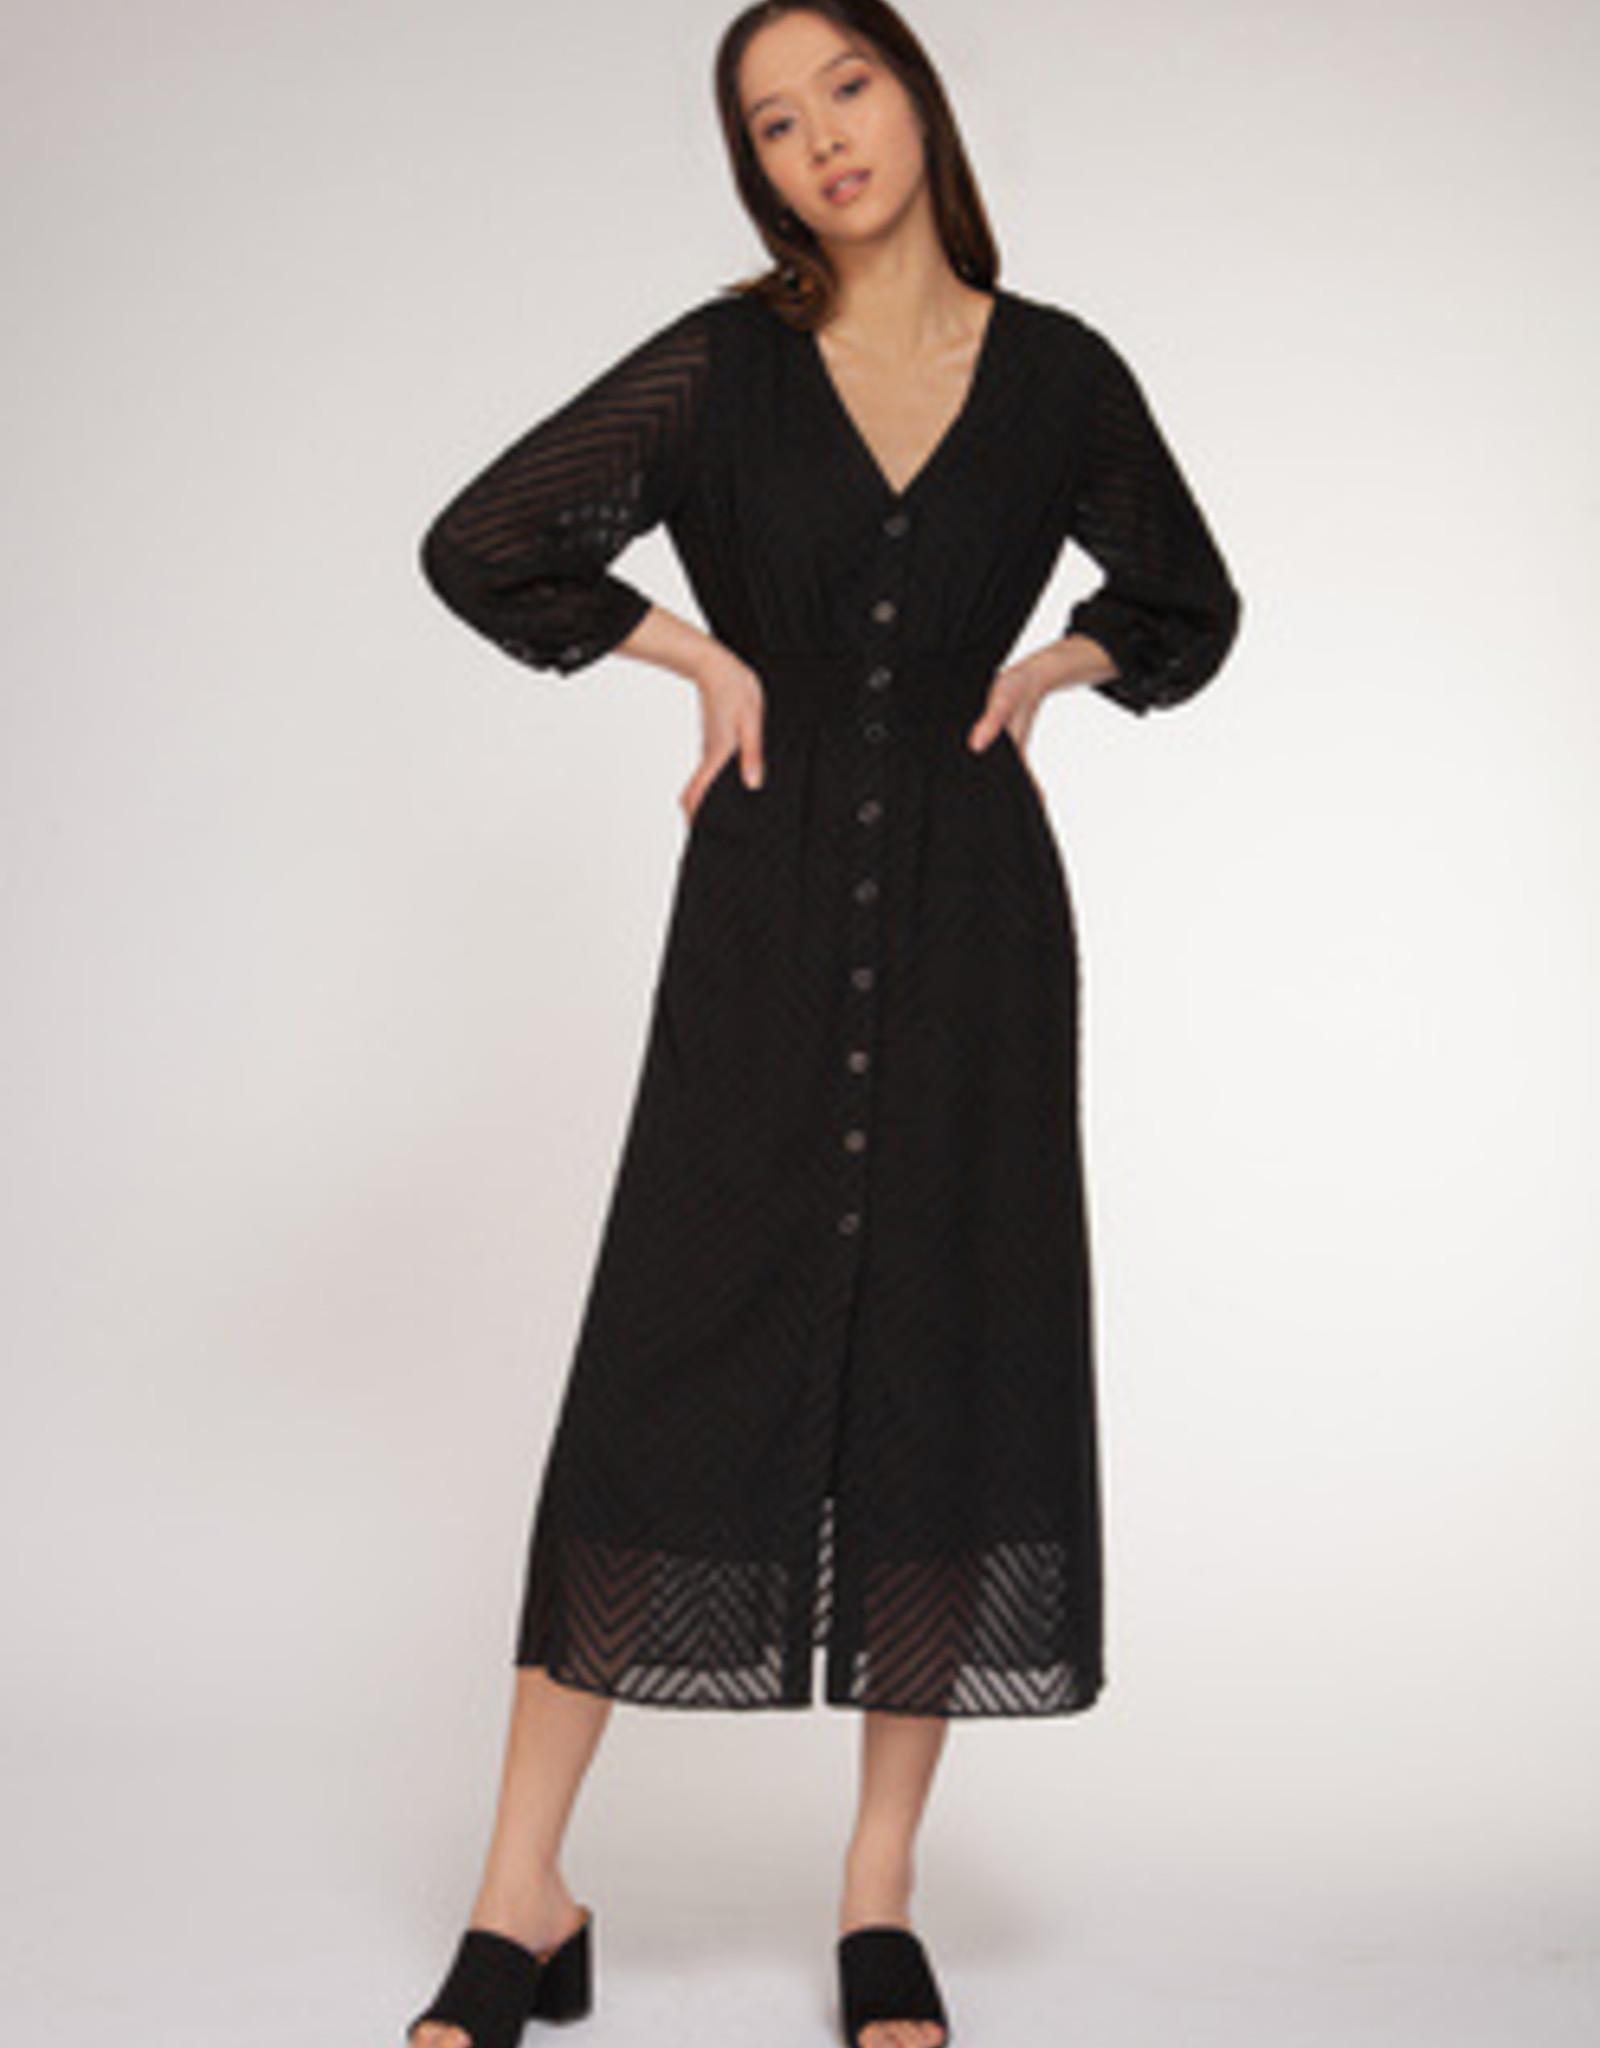 Dex Bros Clothing Co Ltd. Smoked Waist Buttion Down Dress